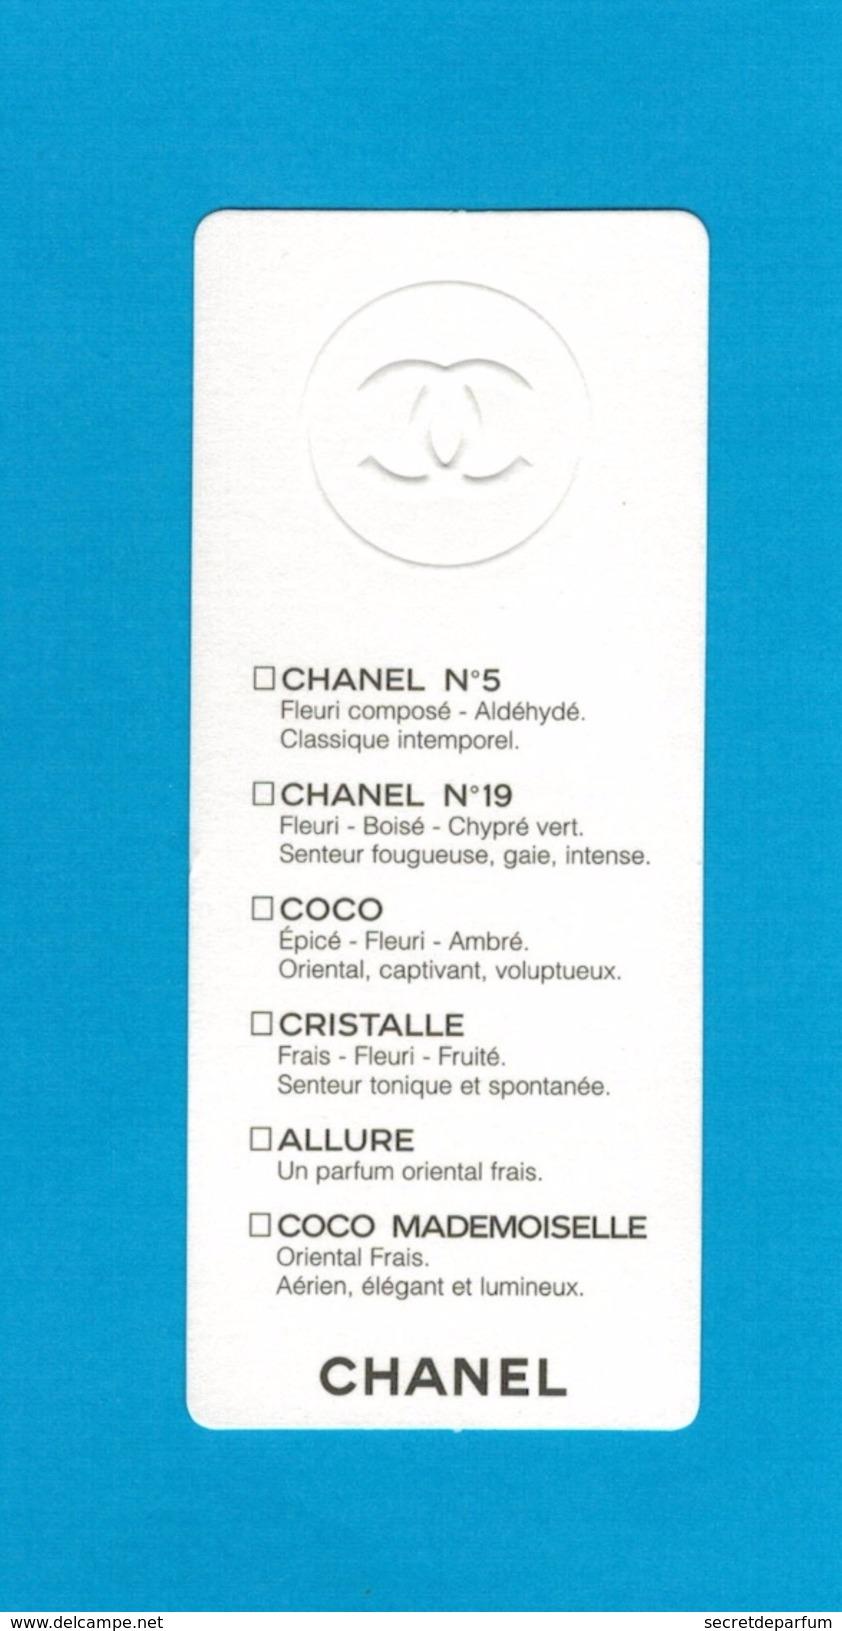 Cartes Parfumées  Carte CHANEL GAMME N°5 N°19 COCO CRISTALLE ALLURE COCO MADEMOISELLE   De CHANEL RECTO VERSO - Cartes Parfumées